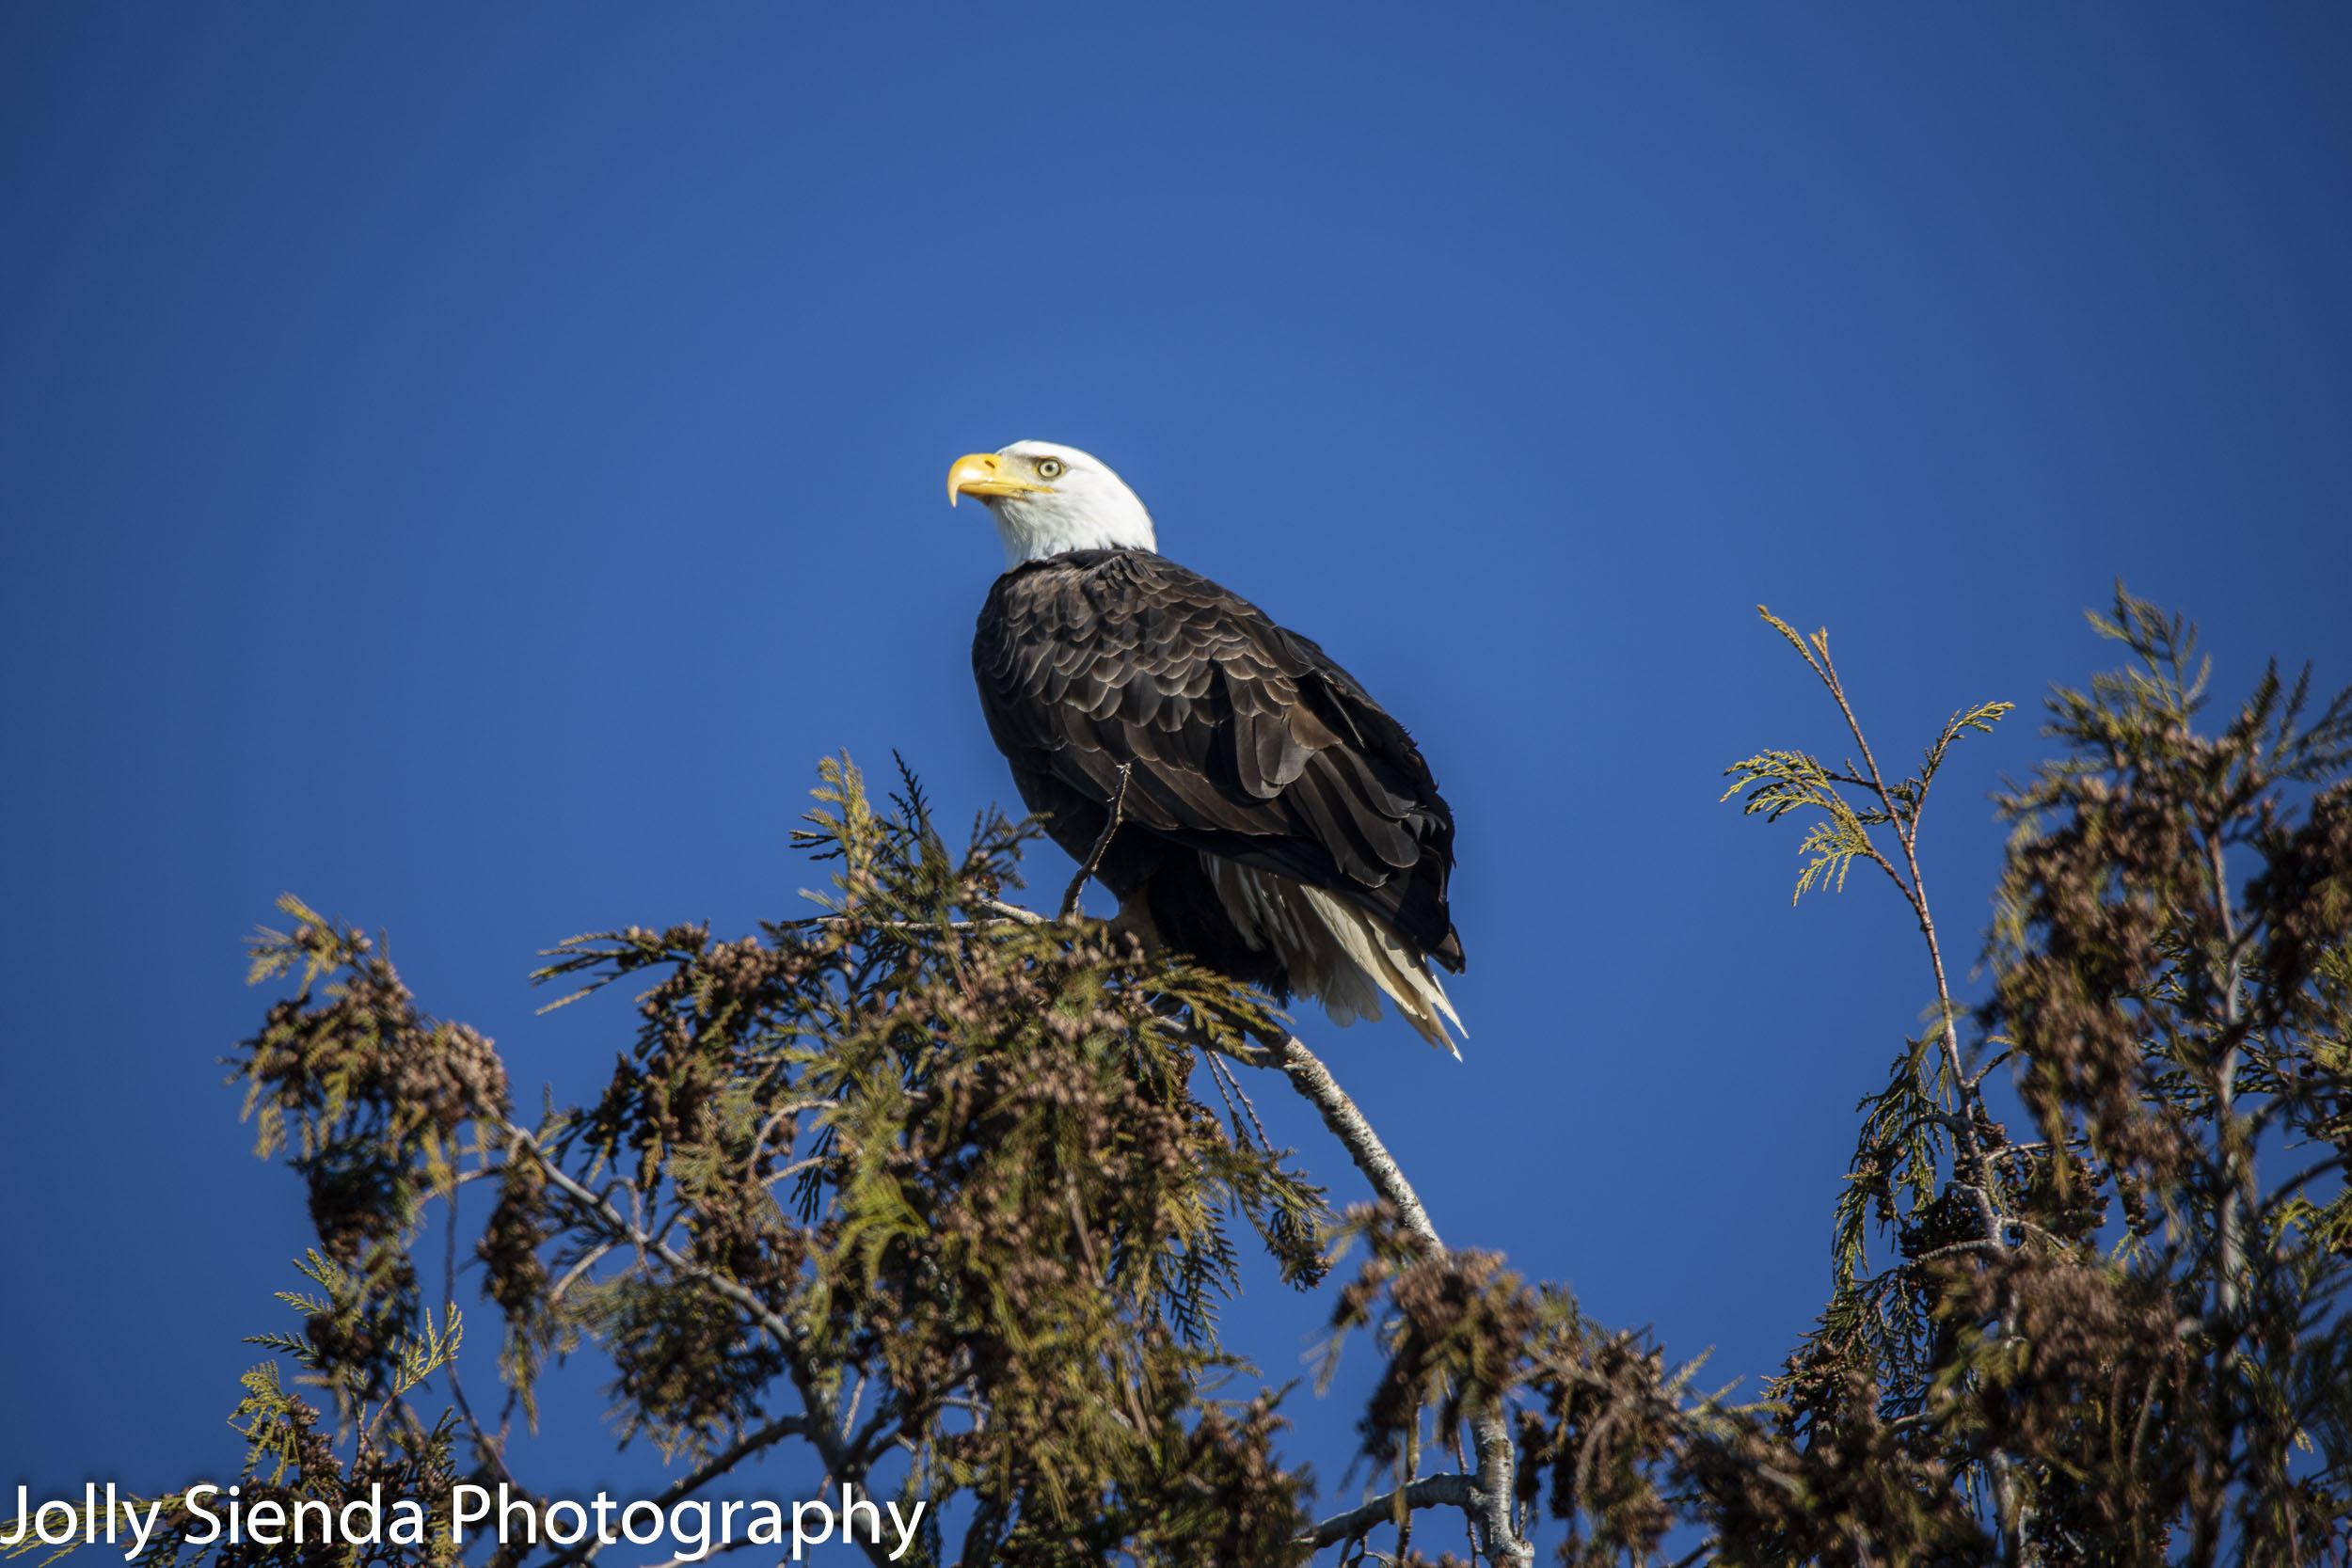 Bald Eagle perched on a Cedar tree